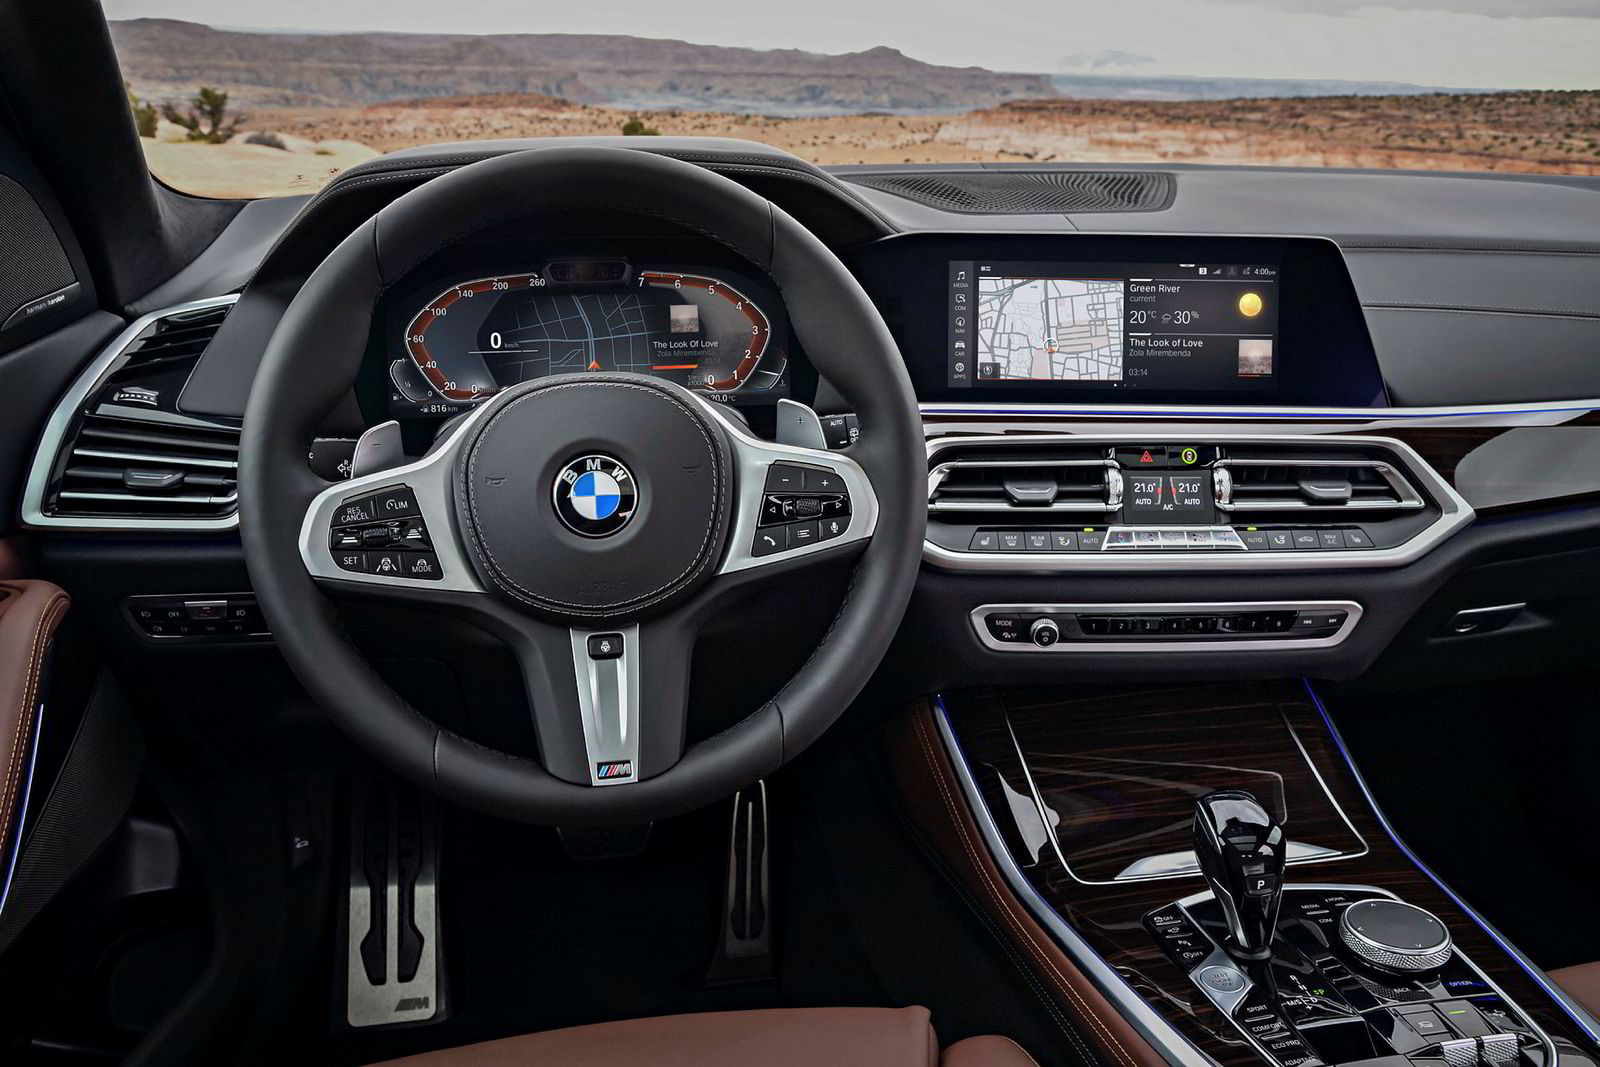 Nå får også BMW digitale display som kan endres etter eget ønske.